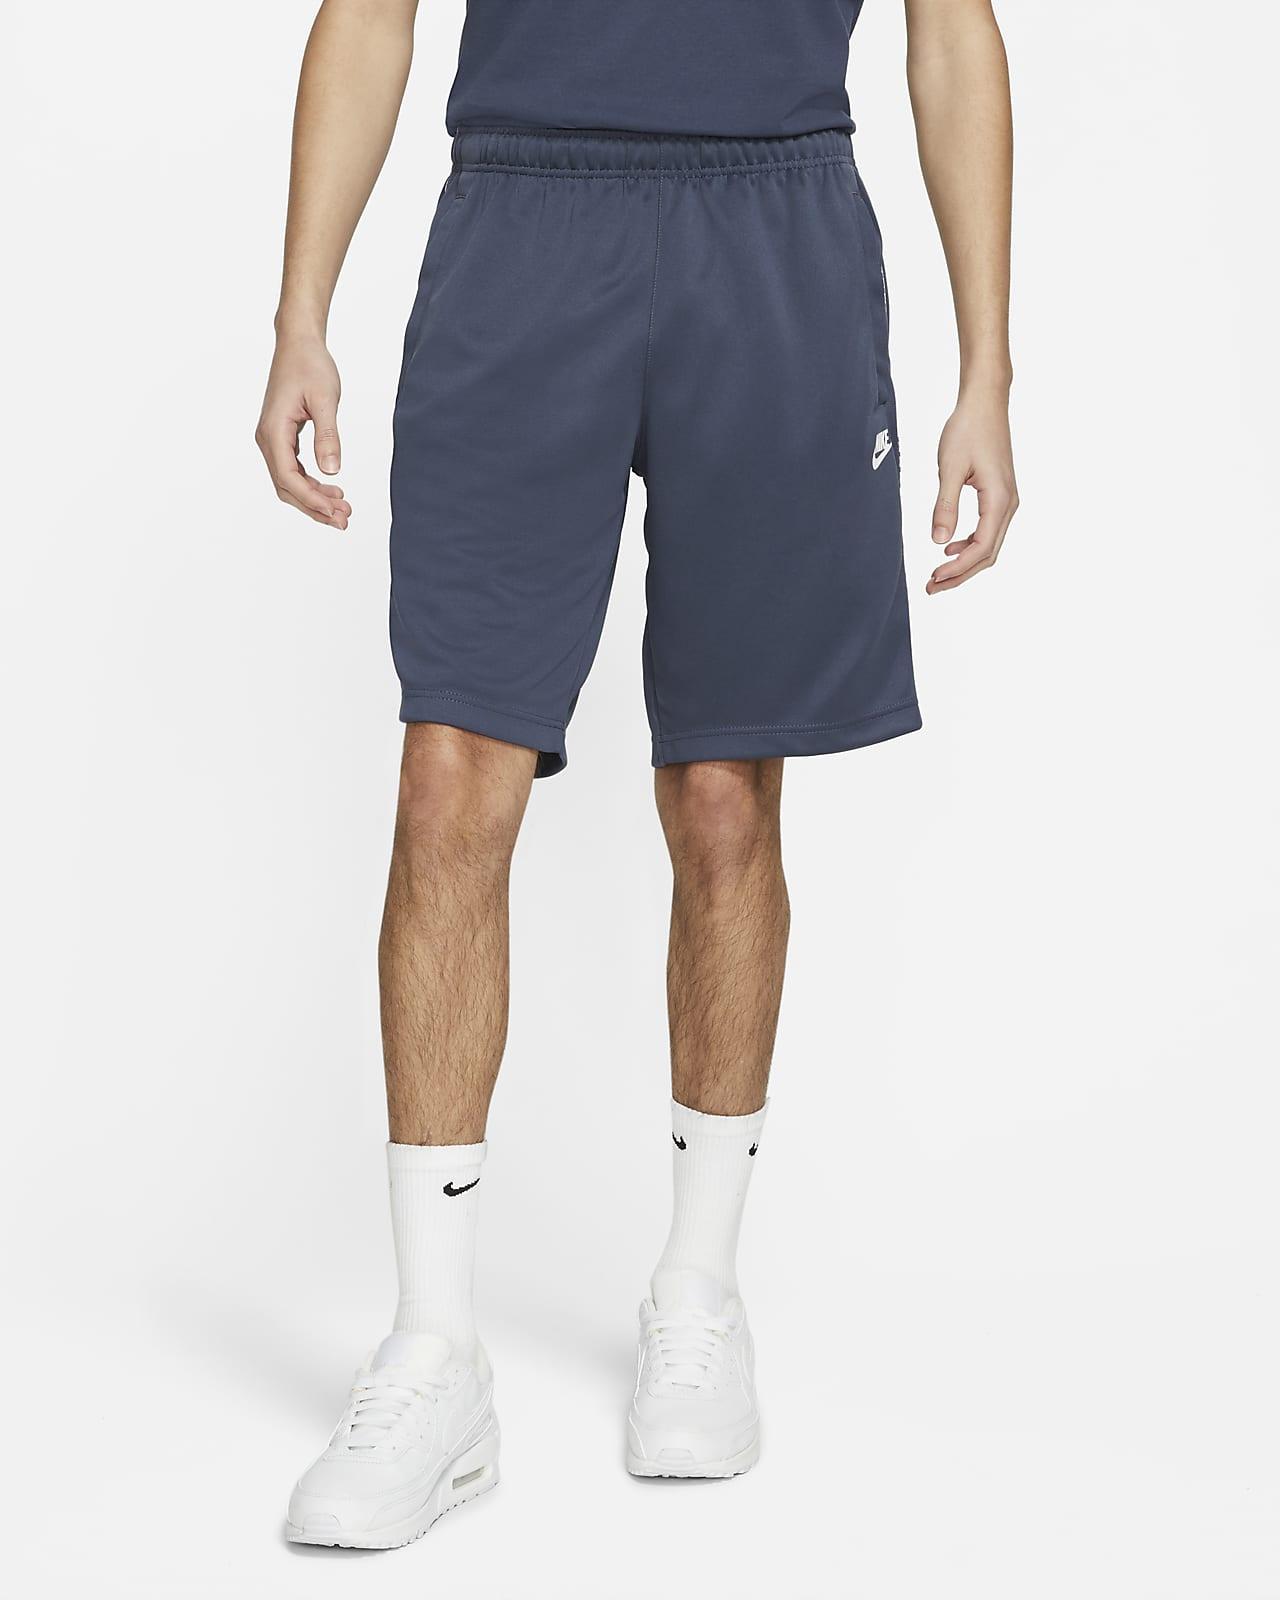 Nike Sportswear Polyknit herenshorts